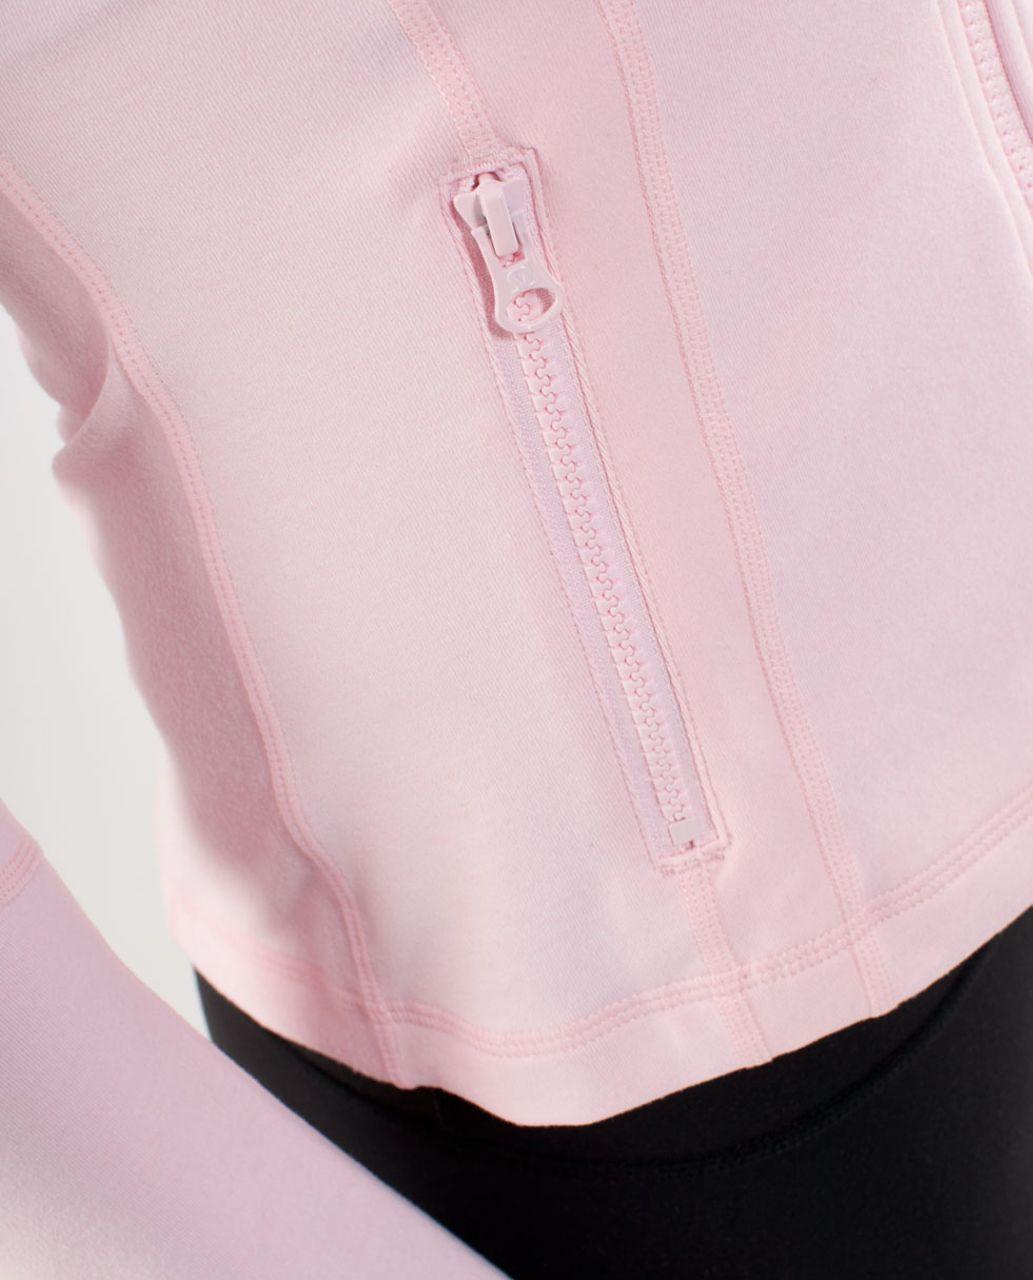 Lululemon Define Jacket - Heathered Pig Pink /  Pig Pink